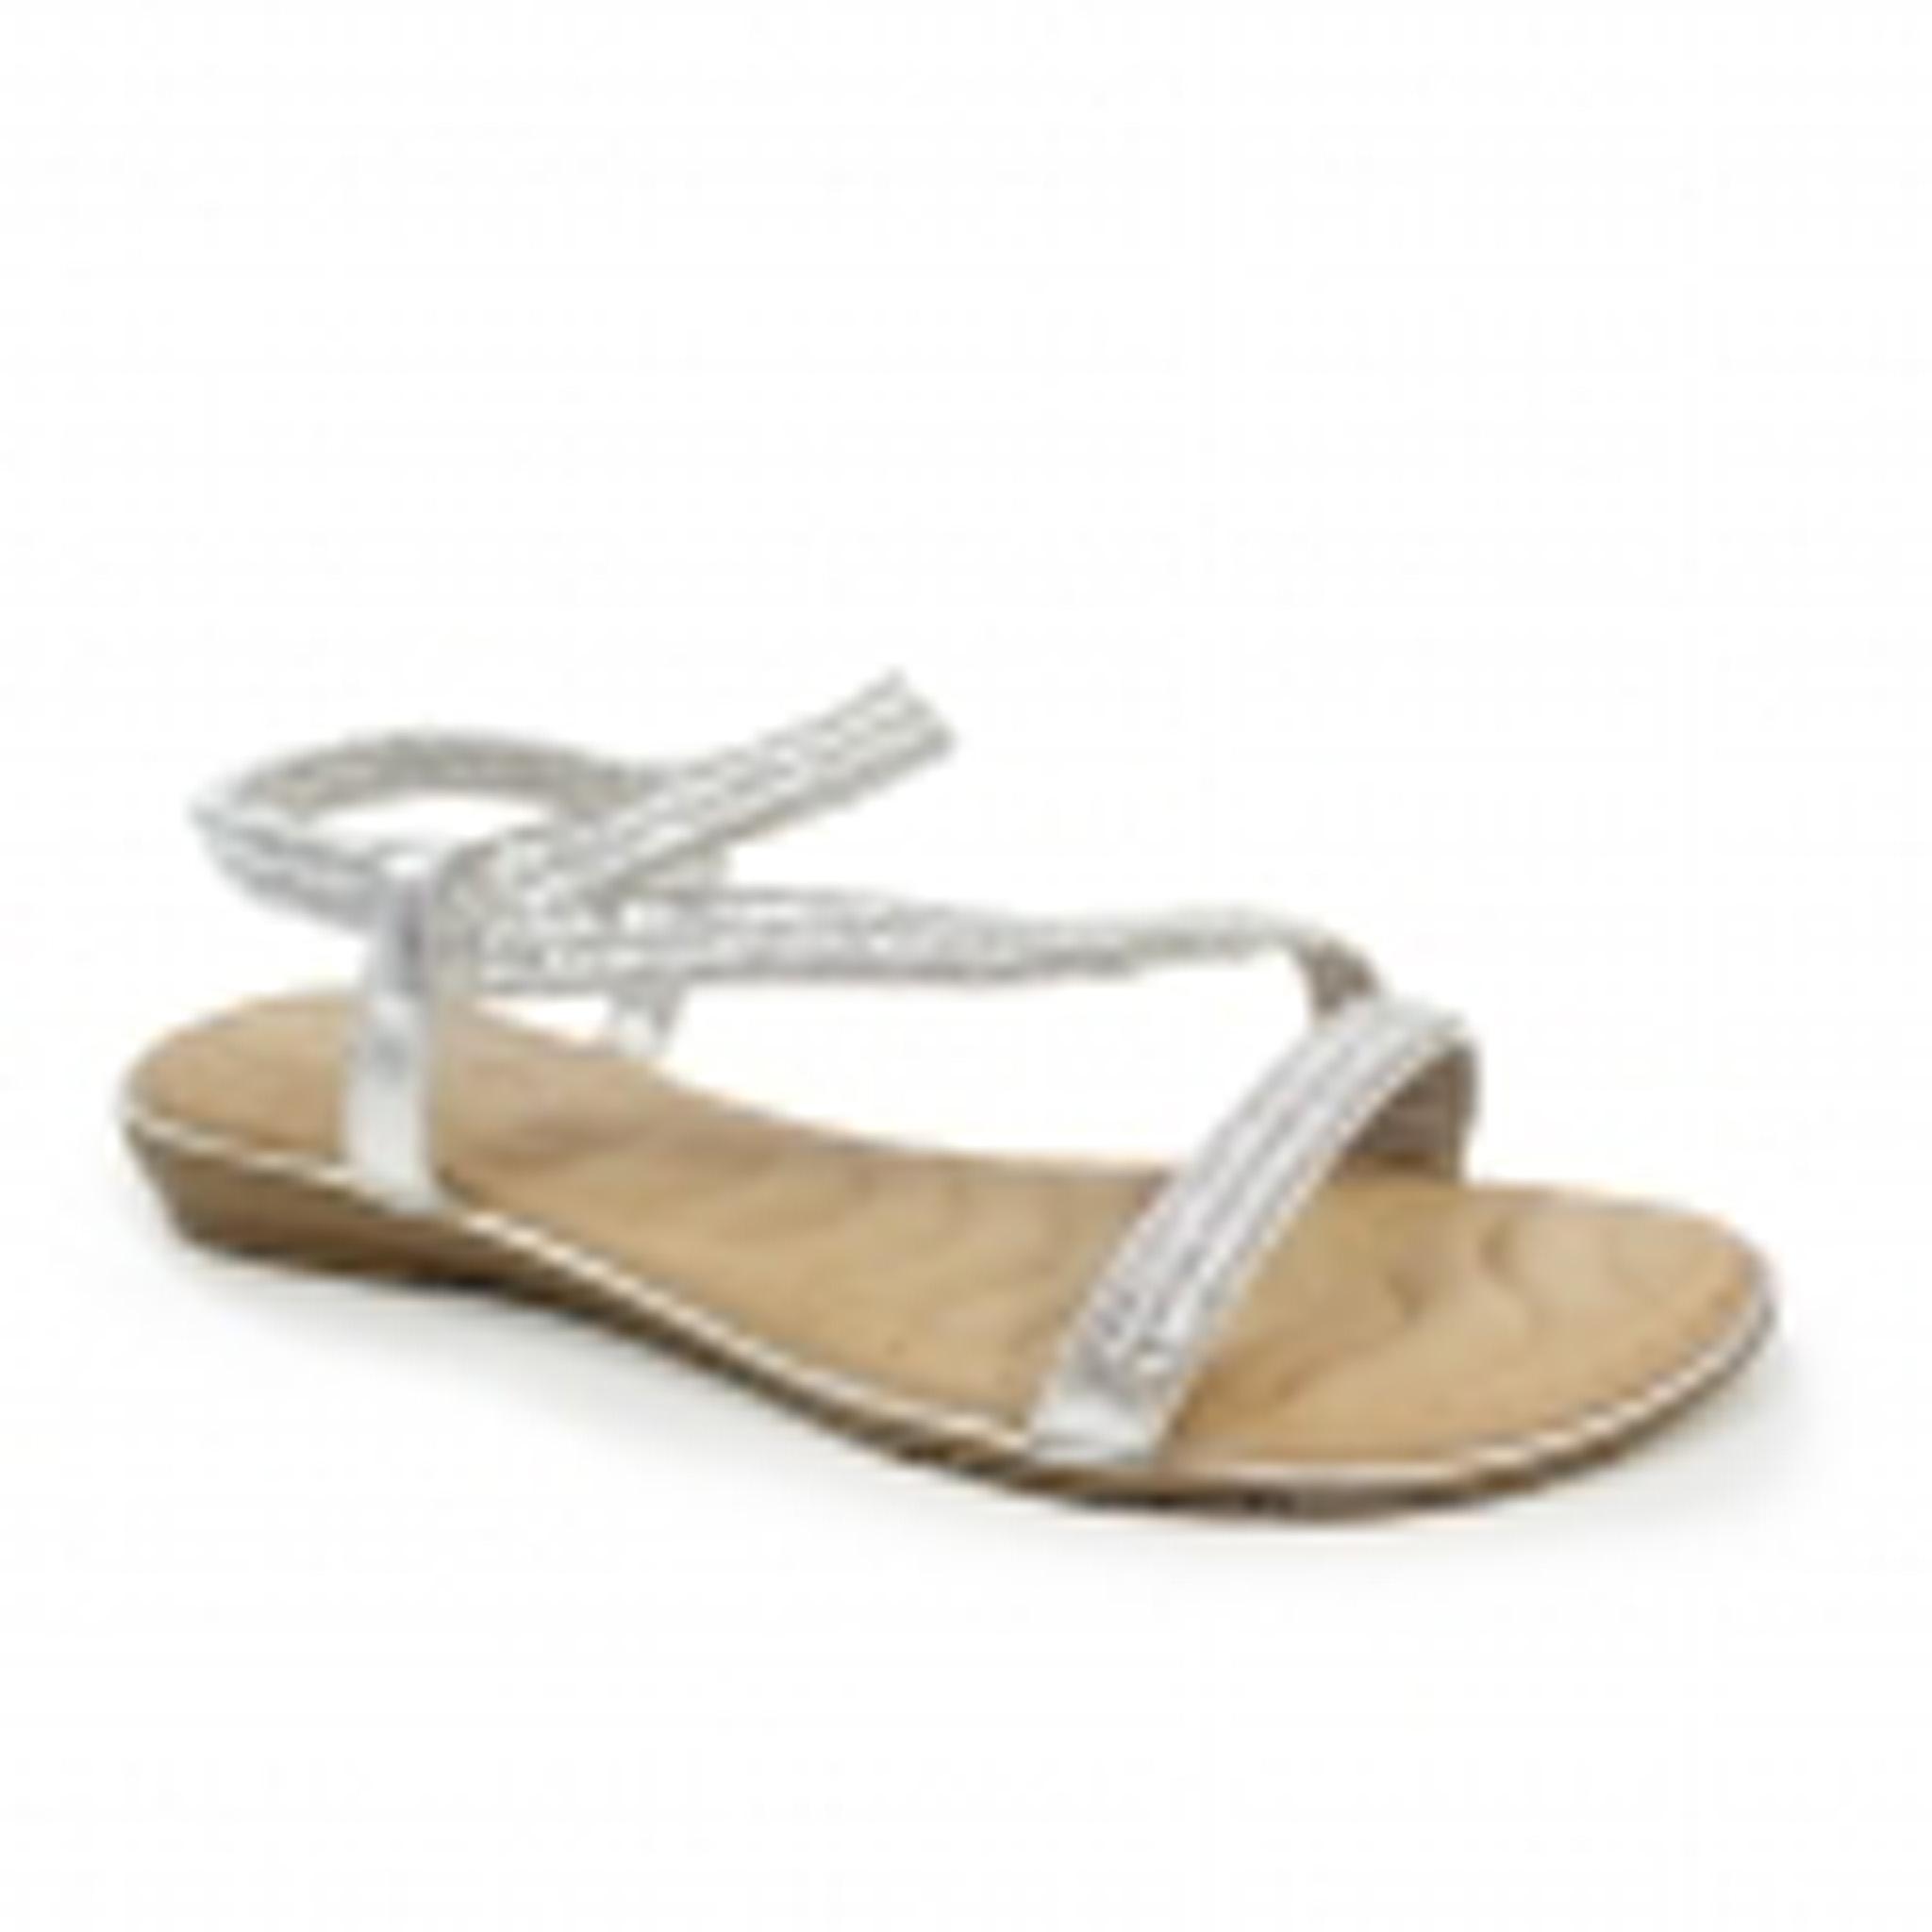 blaise-glitz-sandal-p3058-175361_thumbmi